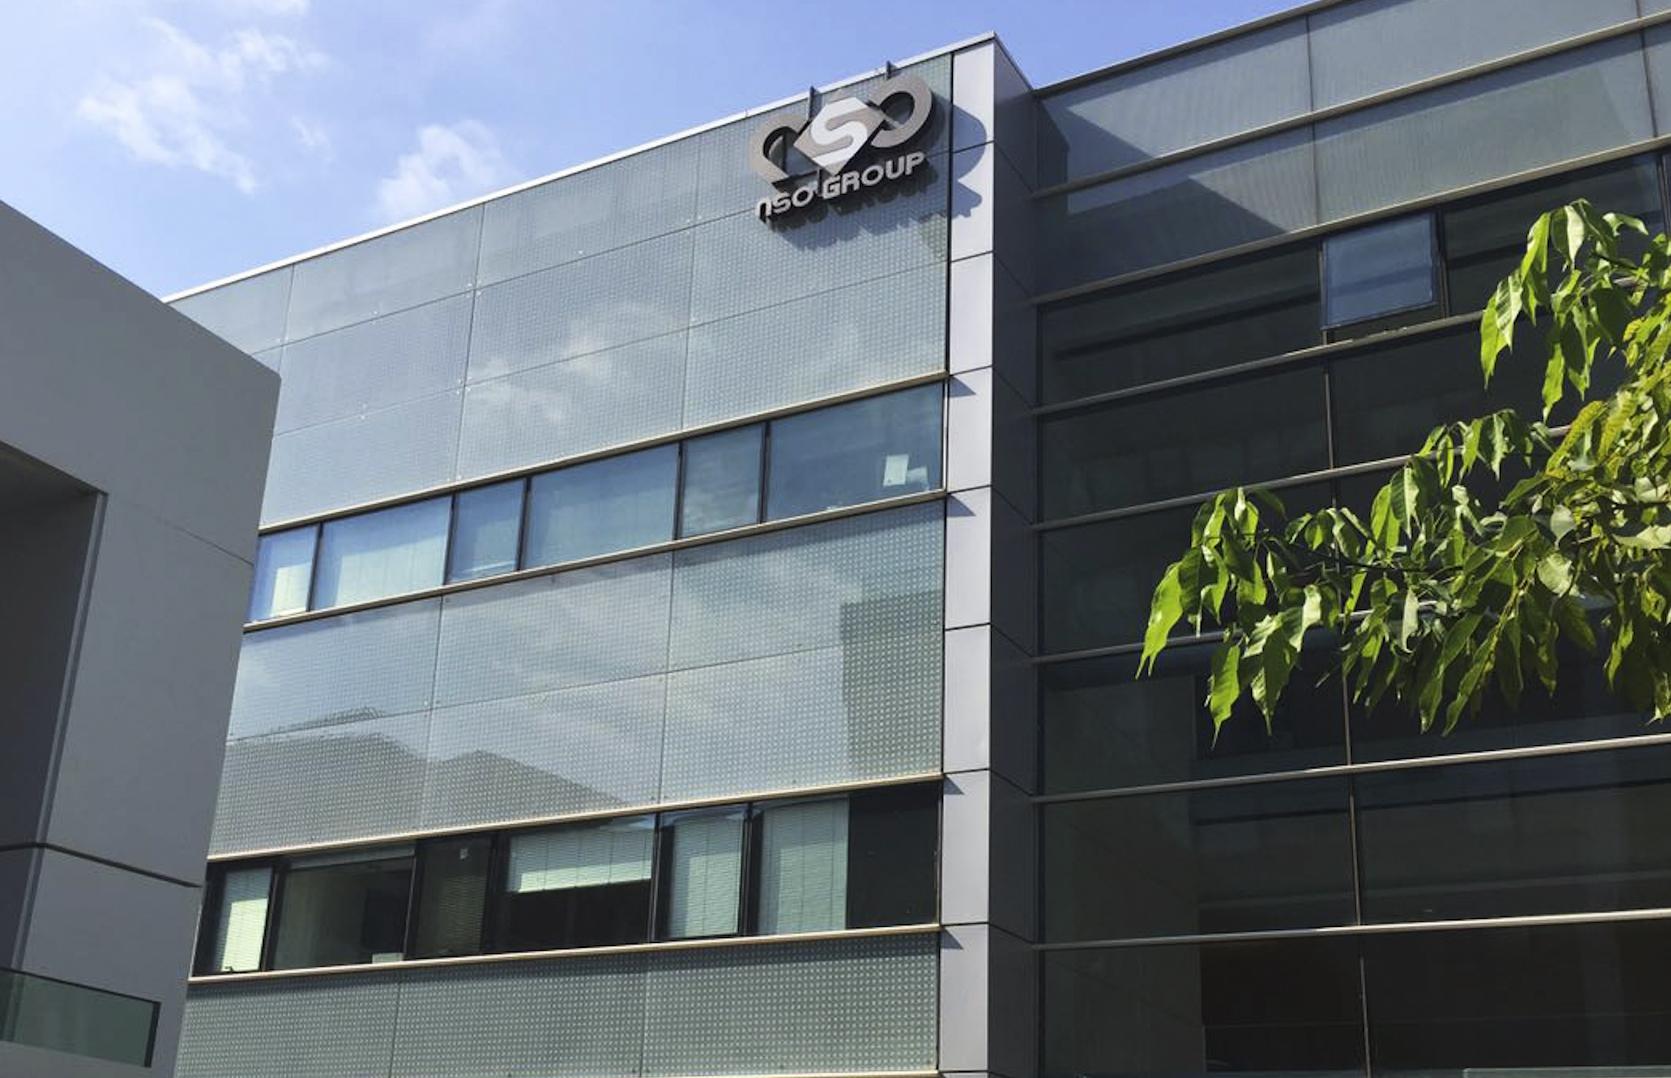 BREAKING: Israeli cyber intelligence firm disowns Pegasus spyware